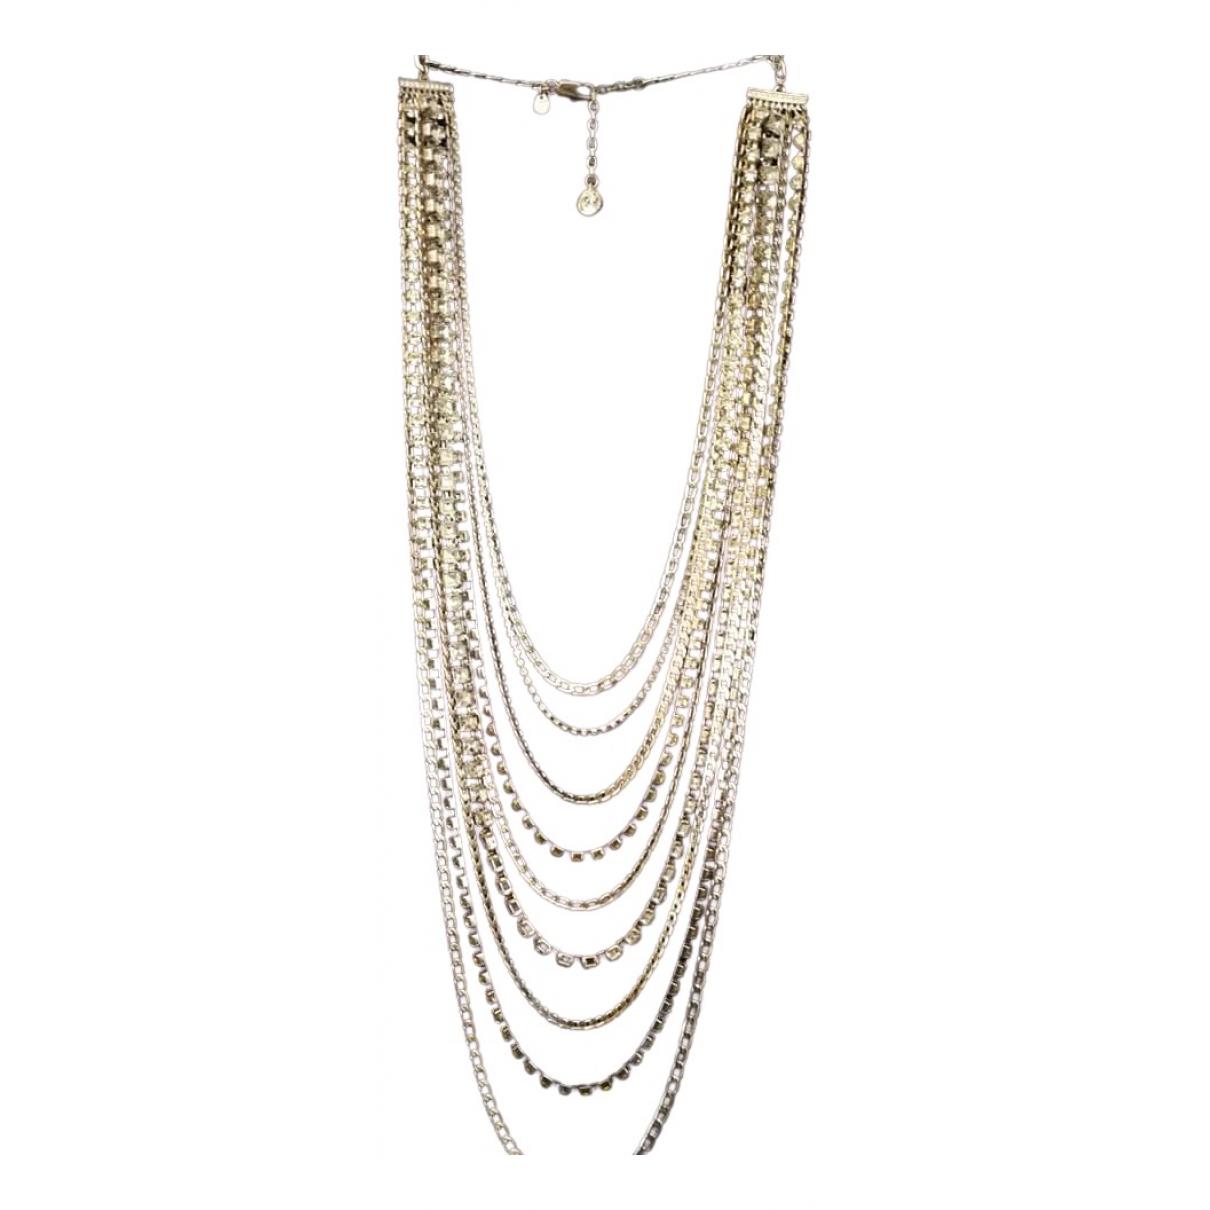 Dyrberg/kern \N Halskette in  Silber Versilbert